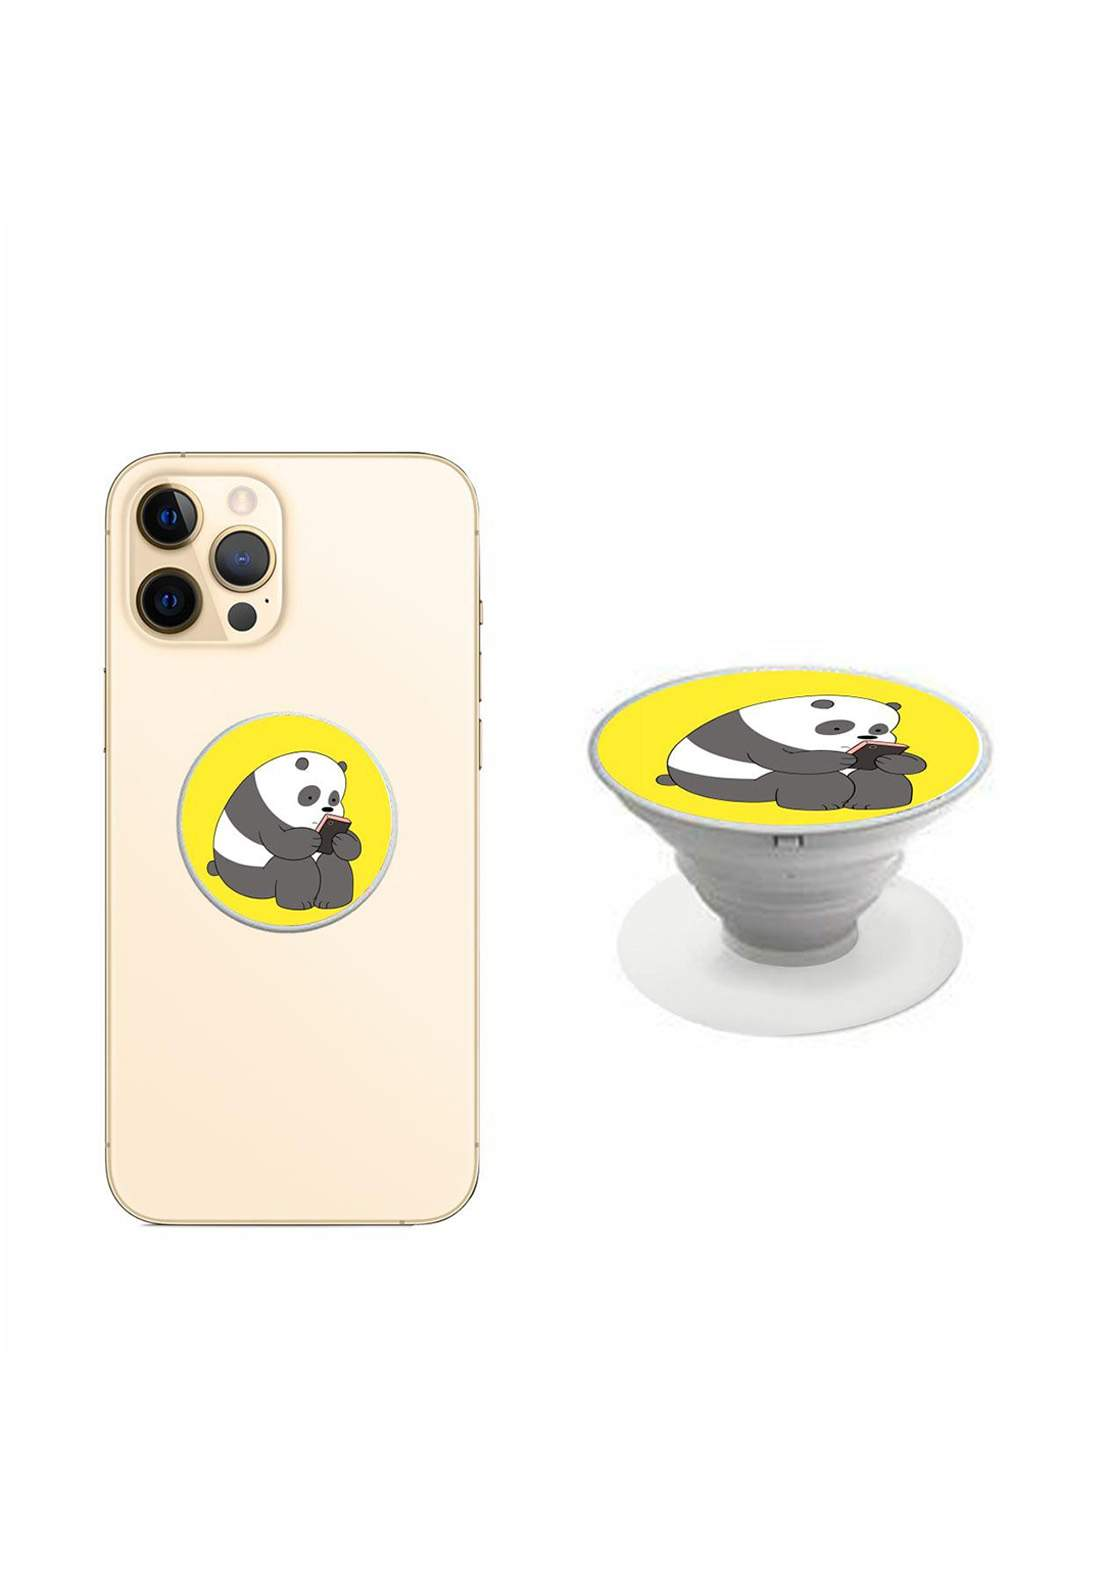 Foldable Grip and Stand for Mobile Phones حلقة حاملة للموبايل